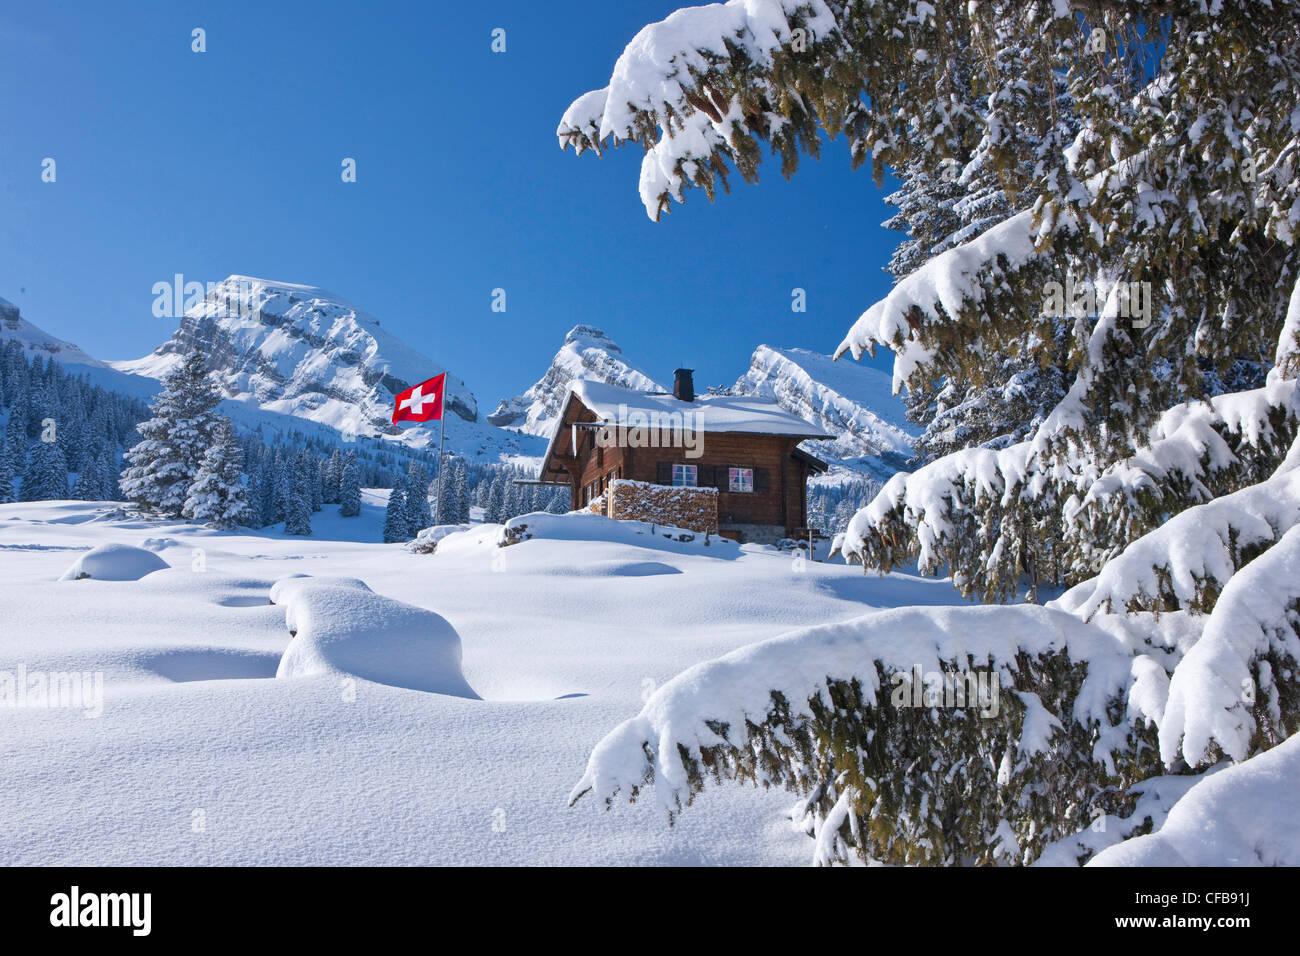 Swiss Mountain House flag, flags, swiss flag, hut, mountain house, alp hut, mountain